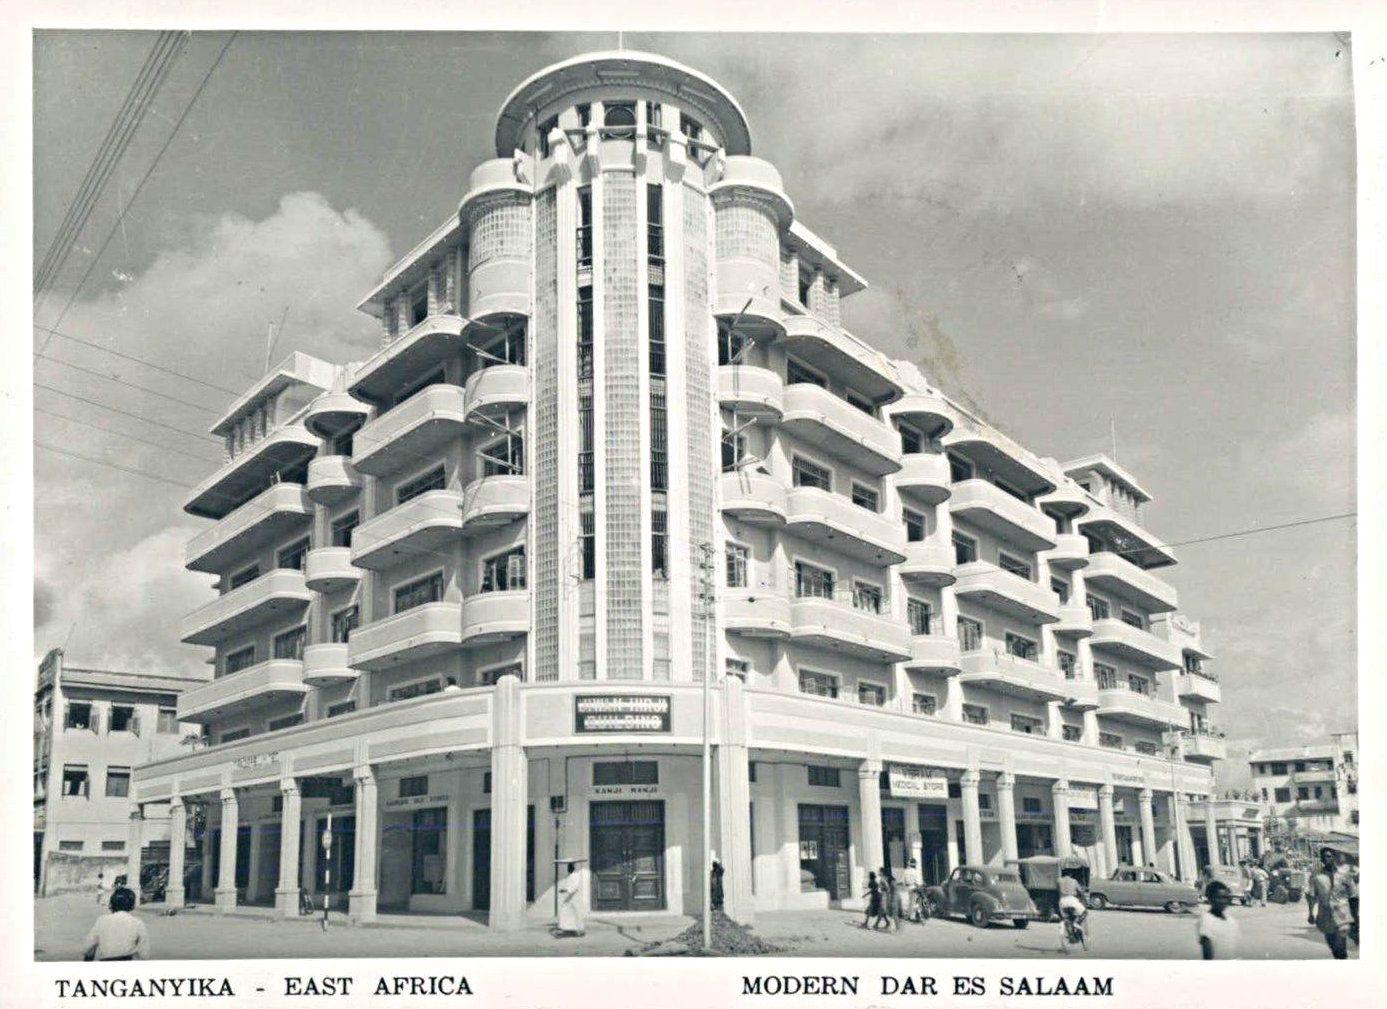 Modern Hotel Dar Es Salaam Tanganyika 1950s Afrika